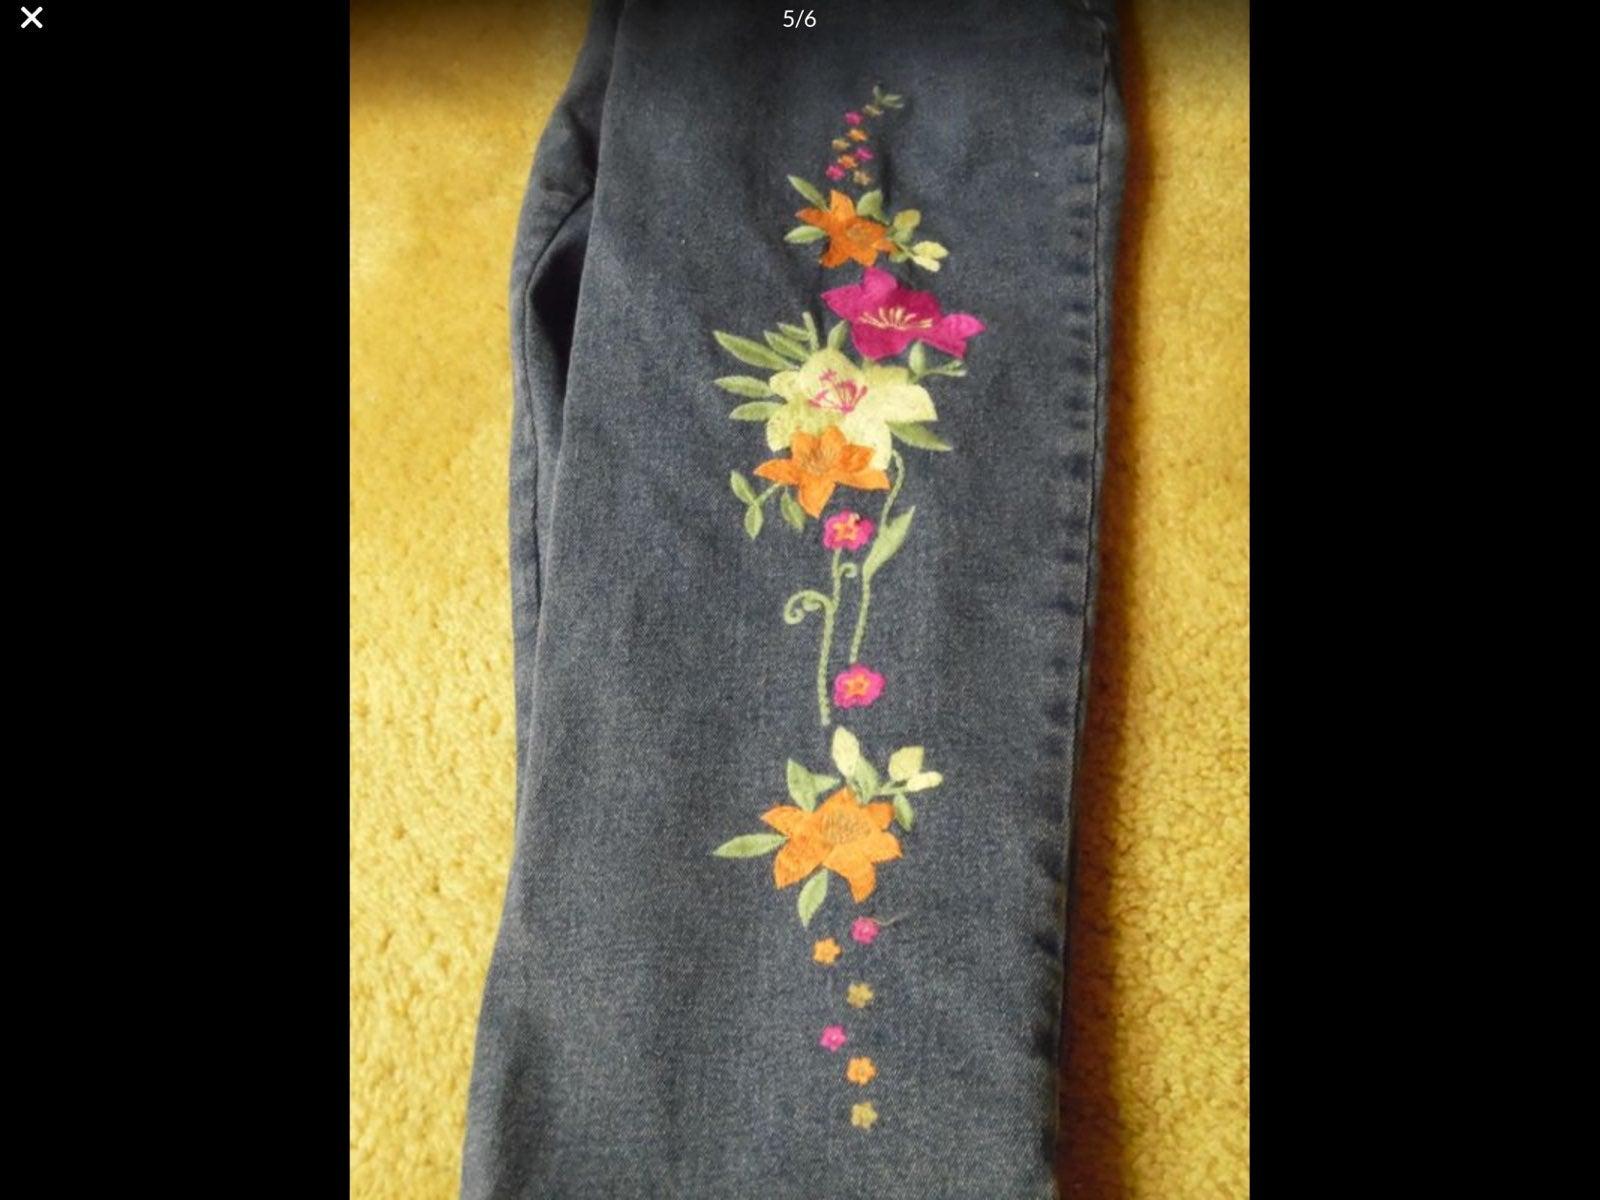 Quacker Factory Floral denim jeans small